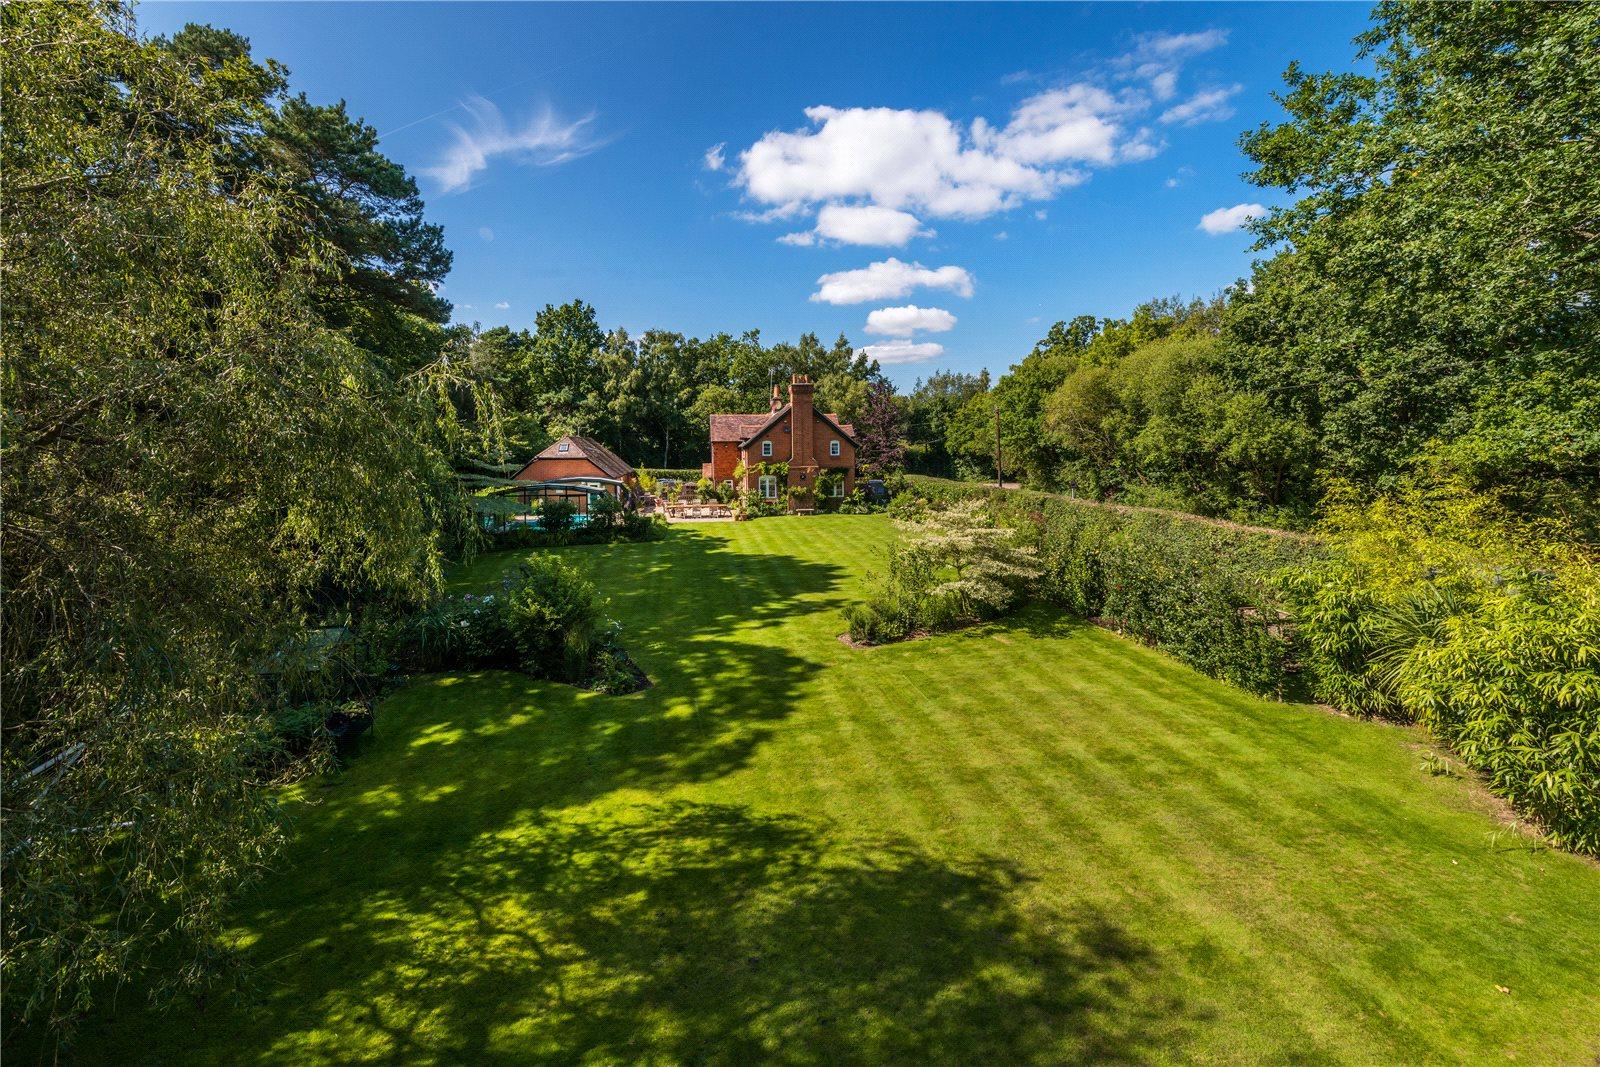 独户住宅 为 销售 在 Dockenfield, Farnham, Surrey, GU10 Farnham, 英格兰